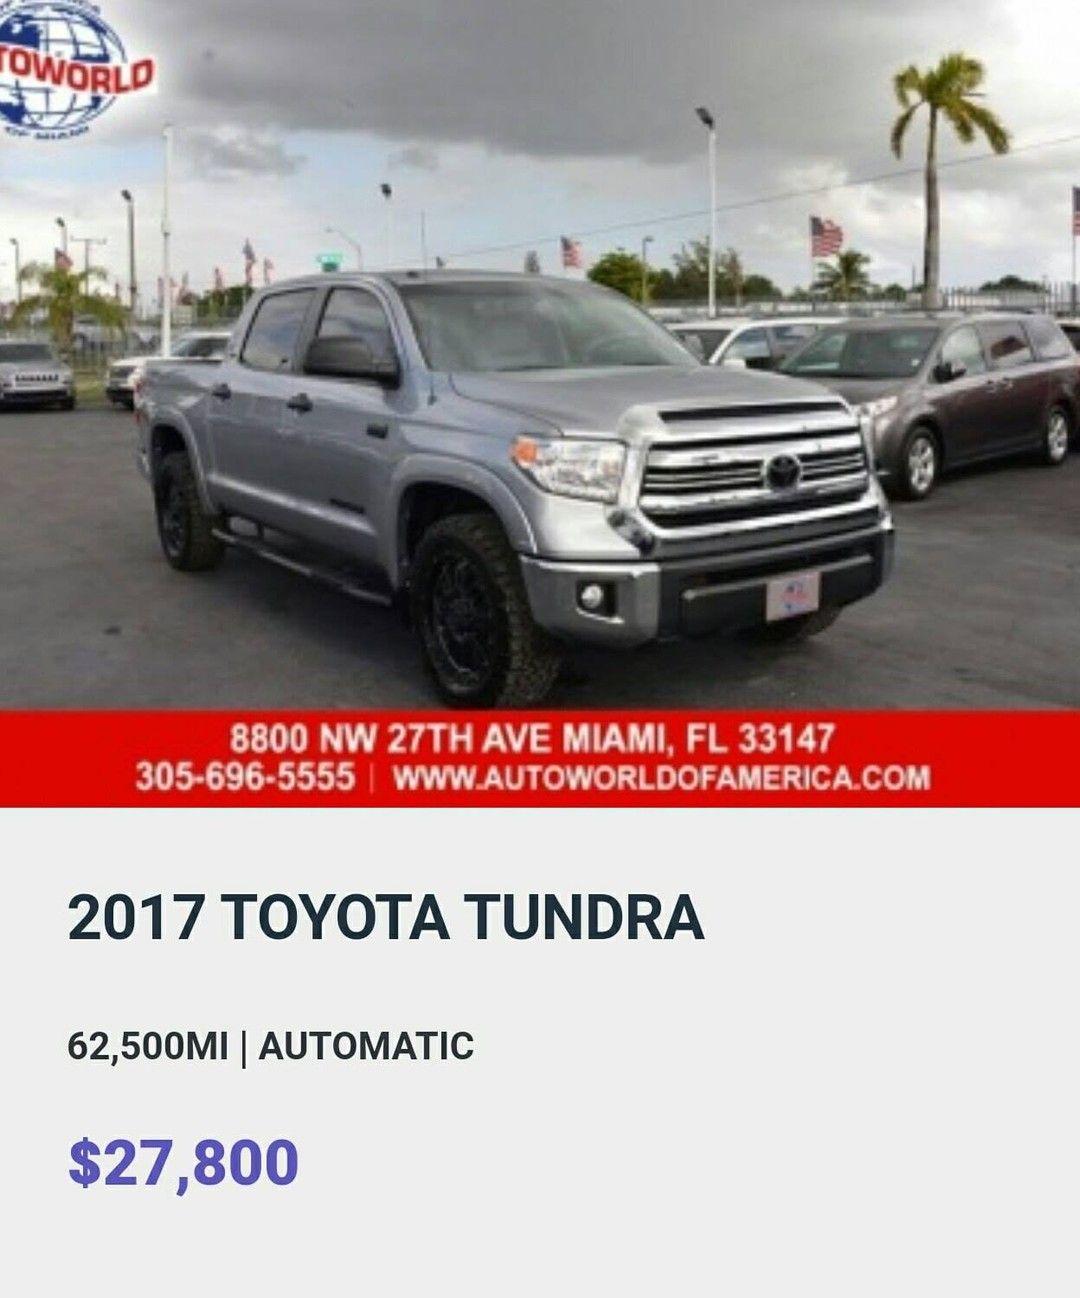 2017 Toyota Tundra Autoworld Of America 8800 Nw 27th Ave Miami Florida 33147 305 696 5555 Dm Autoworld Of America For More In 2021 Toyota Tundra Salvage Cars Toyota